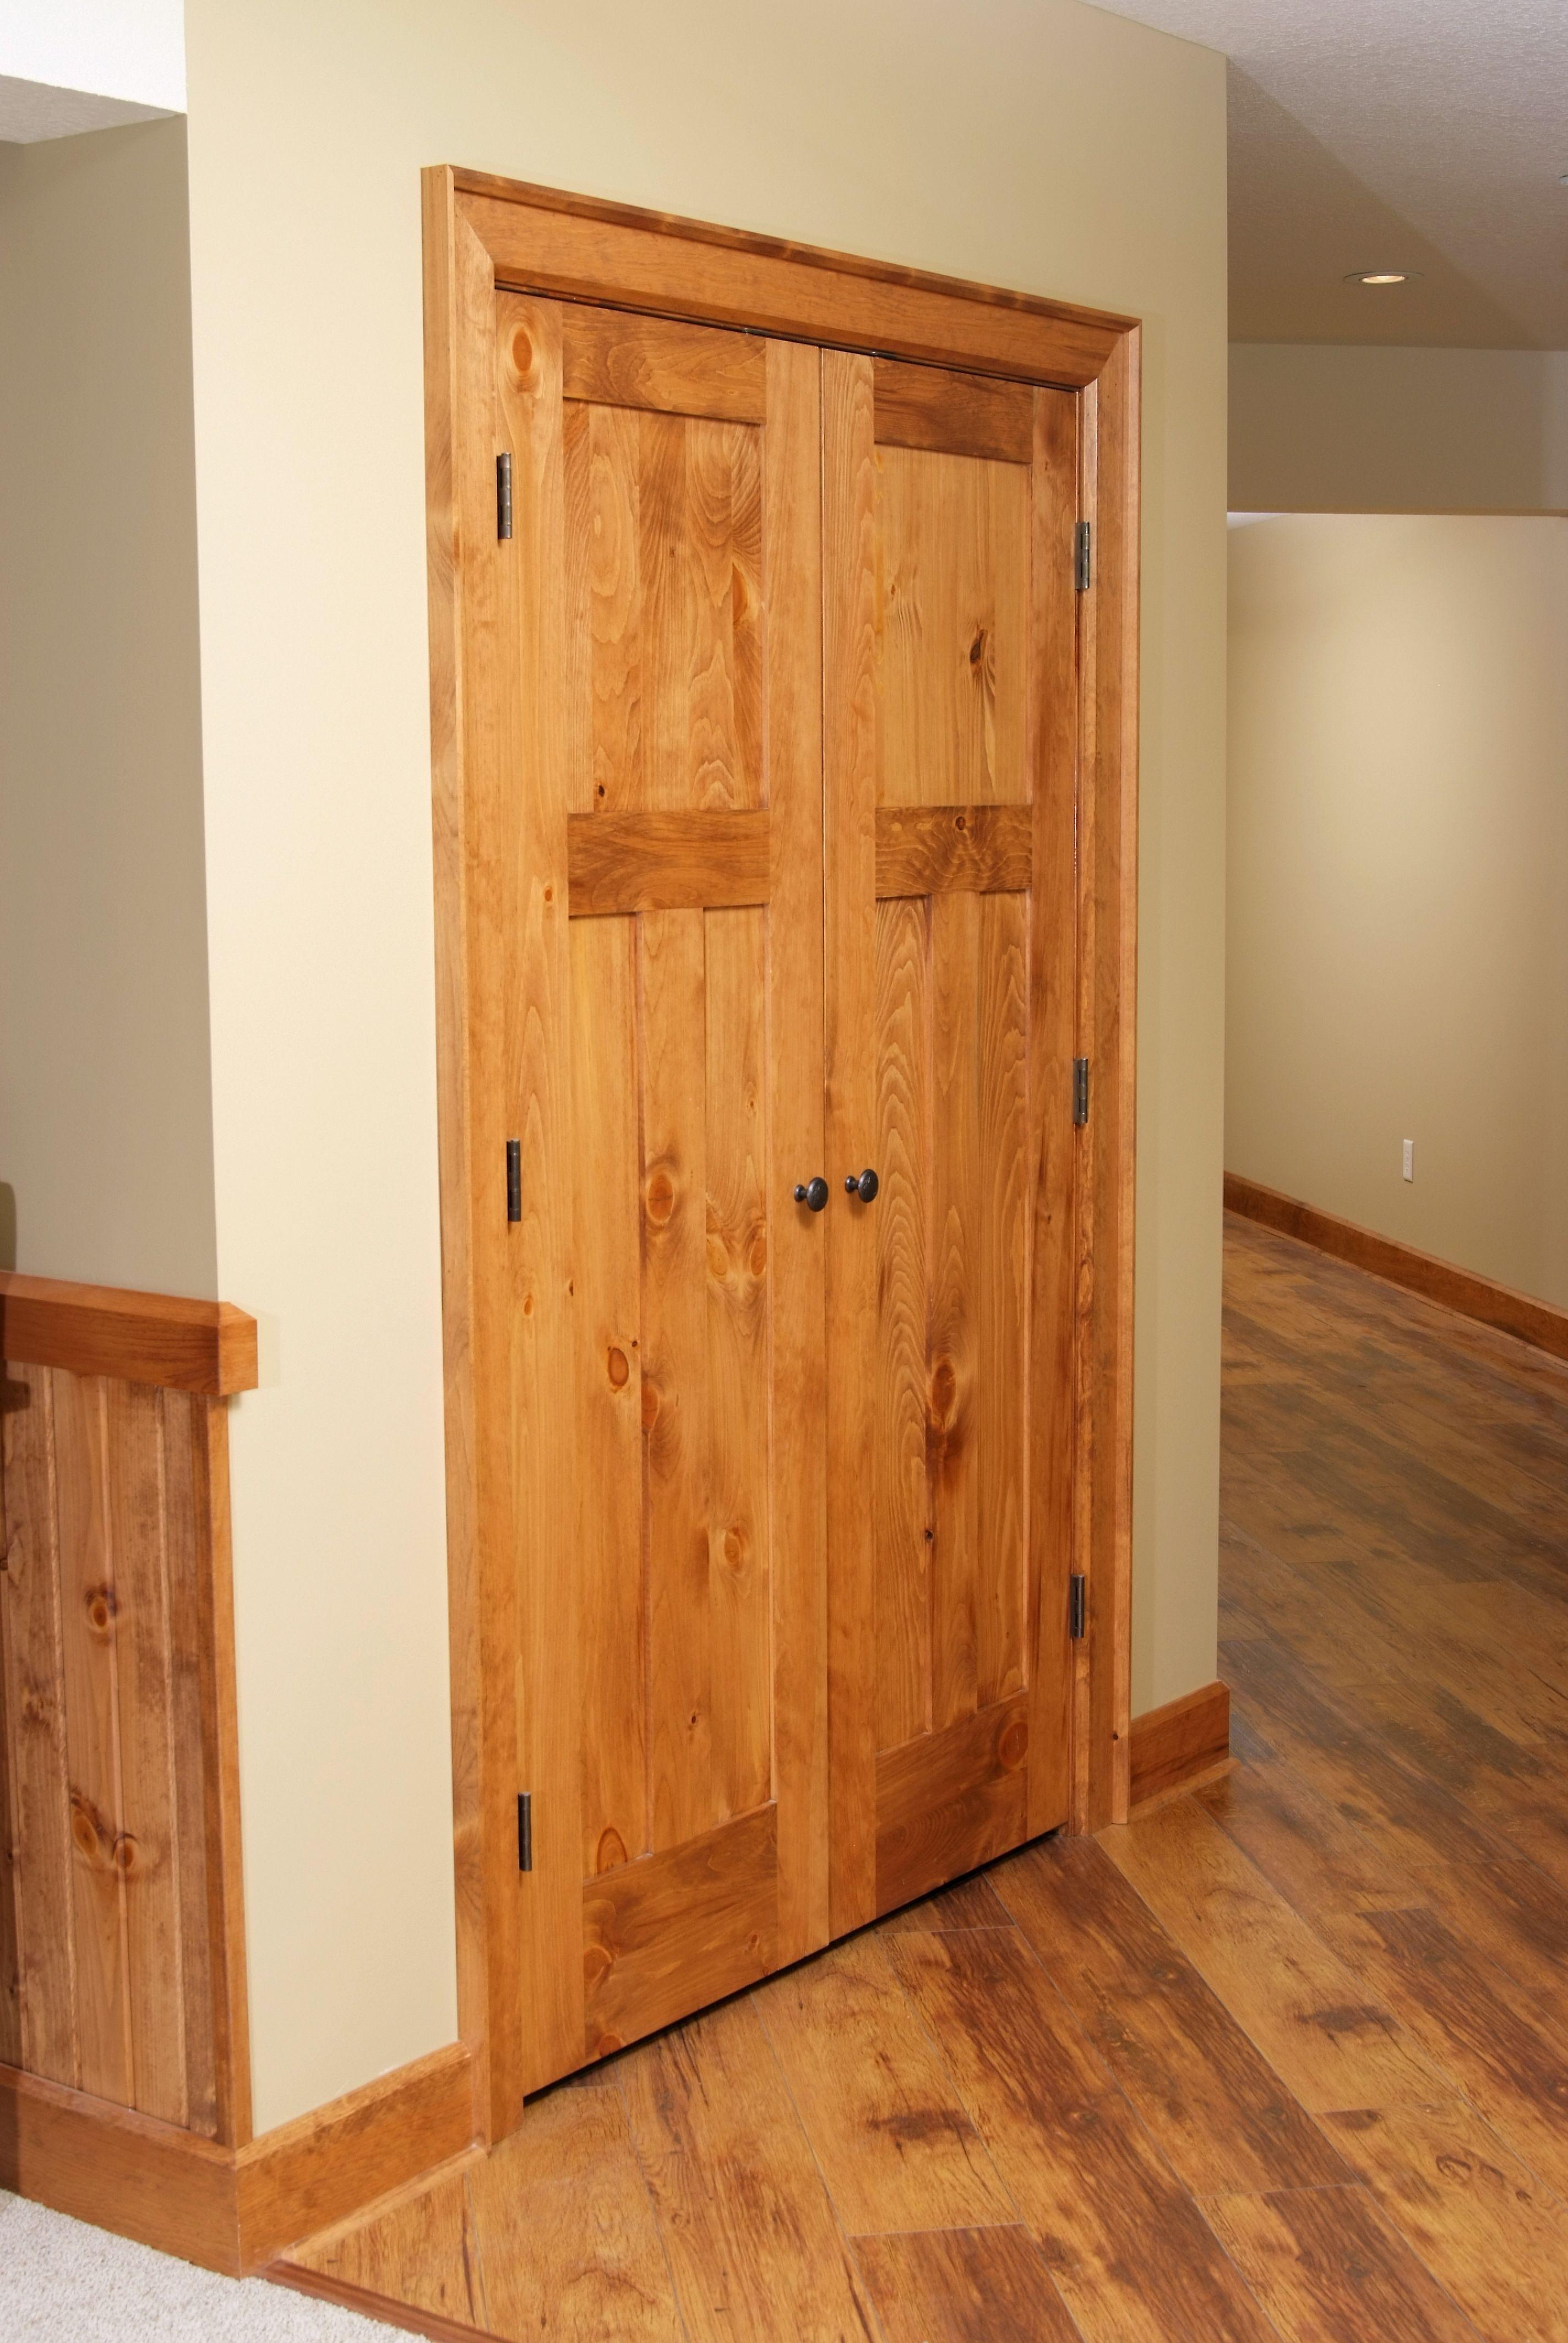 shaker style knotty pine double door closet unit. | interior doors